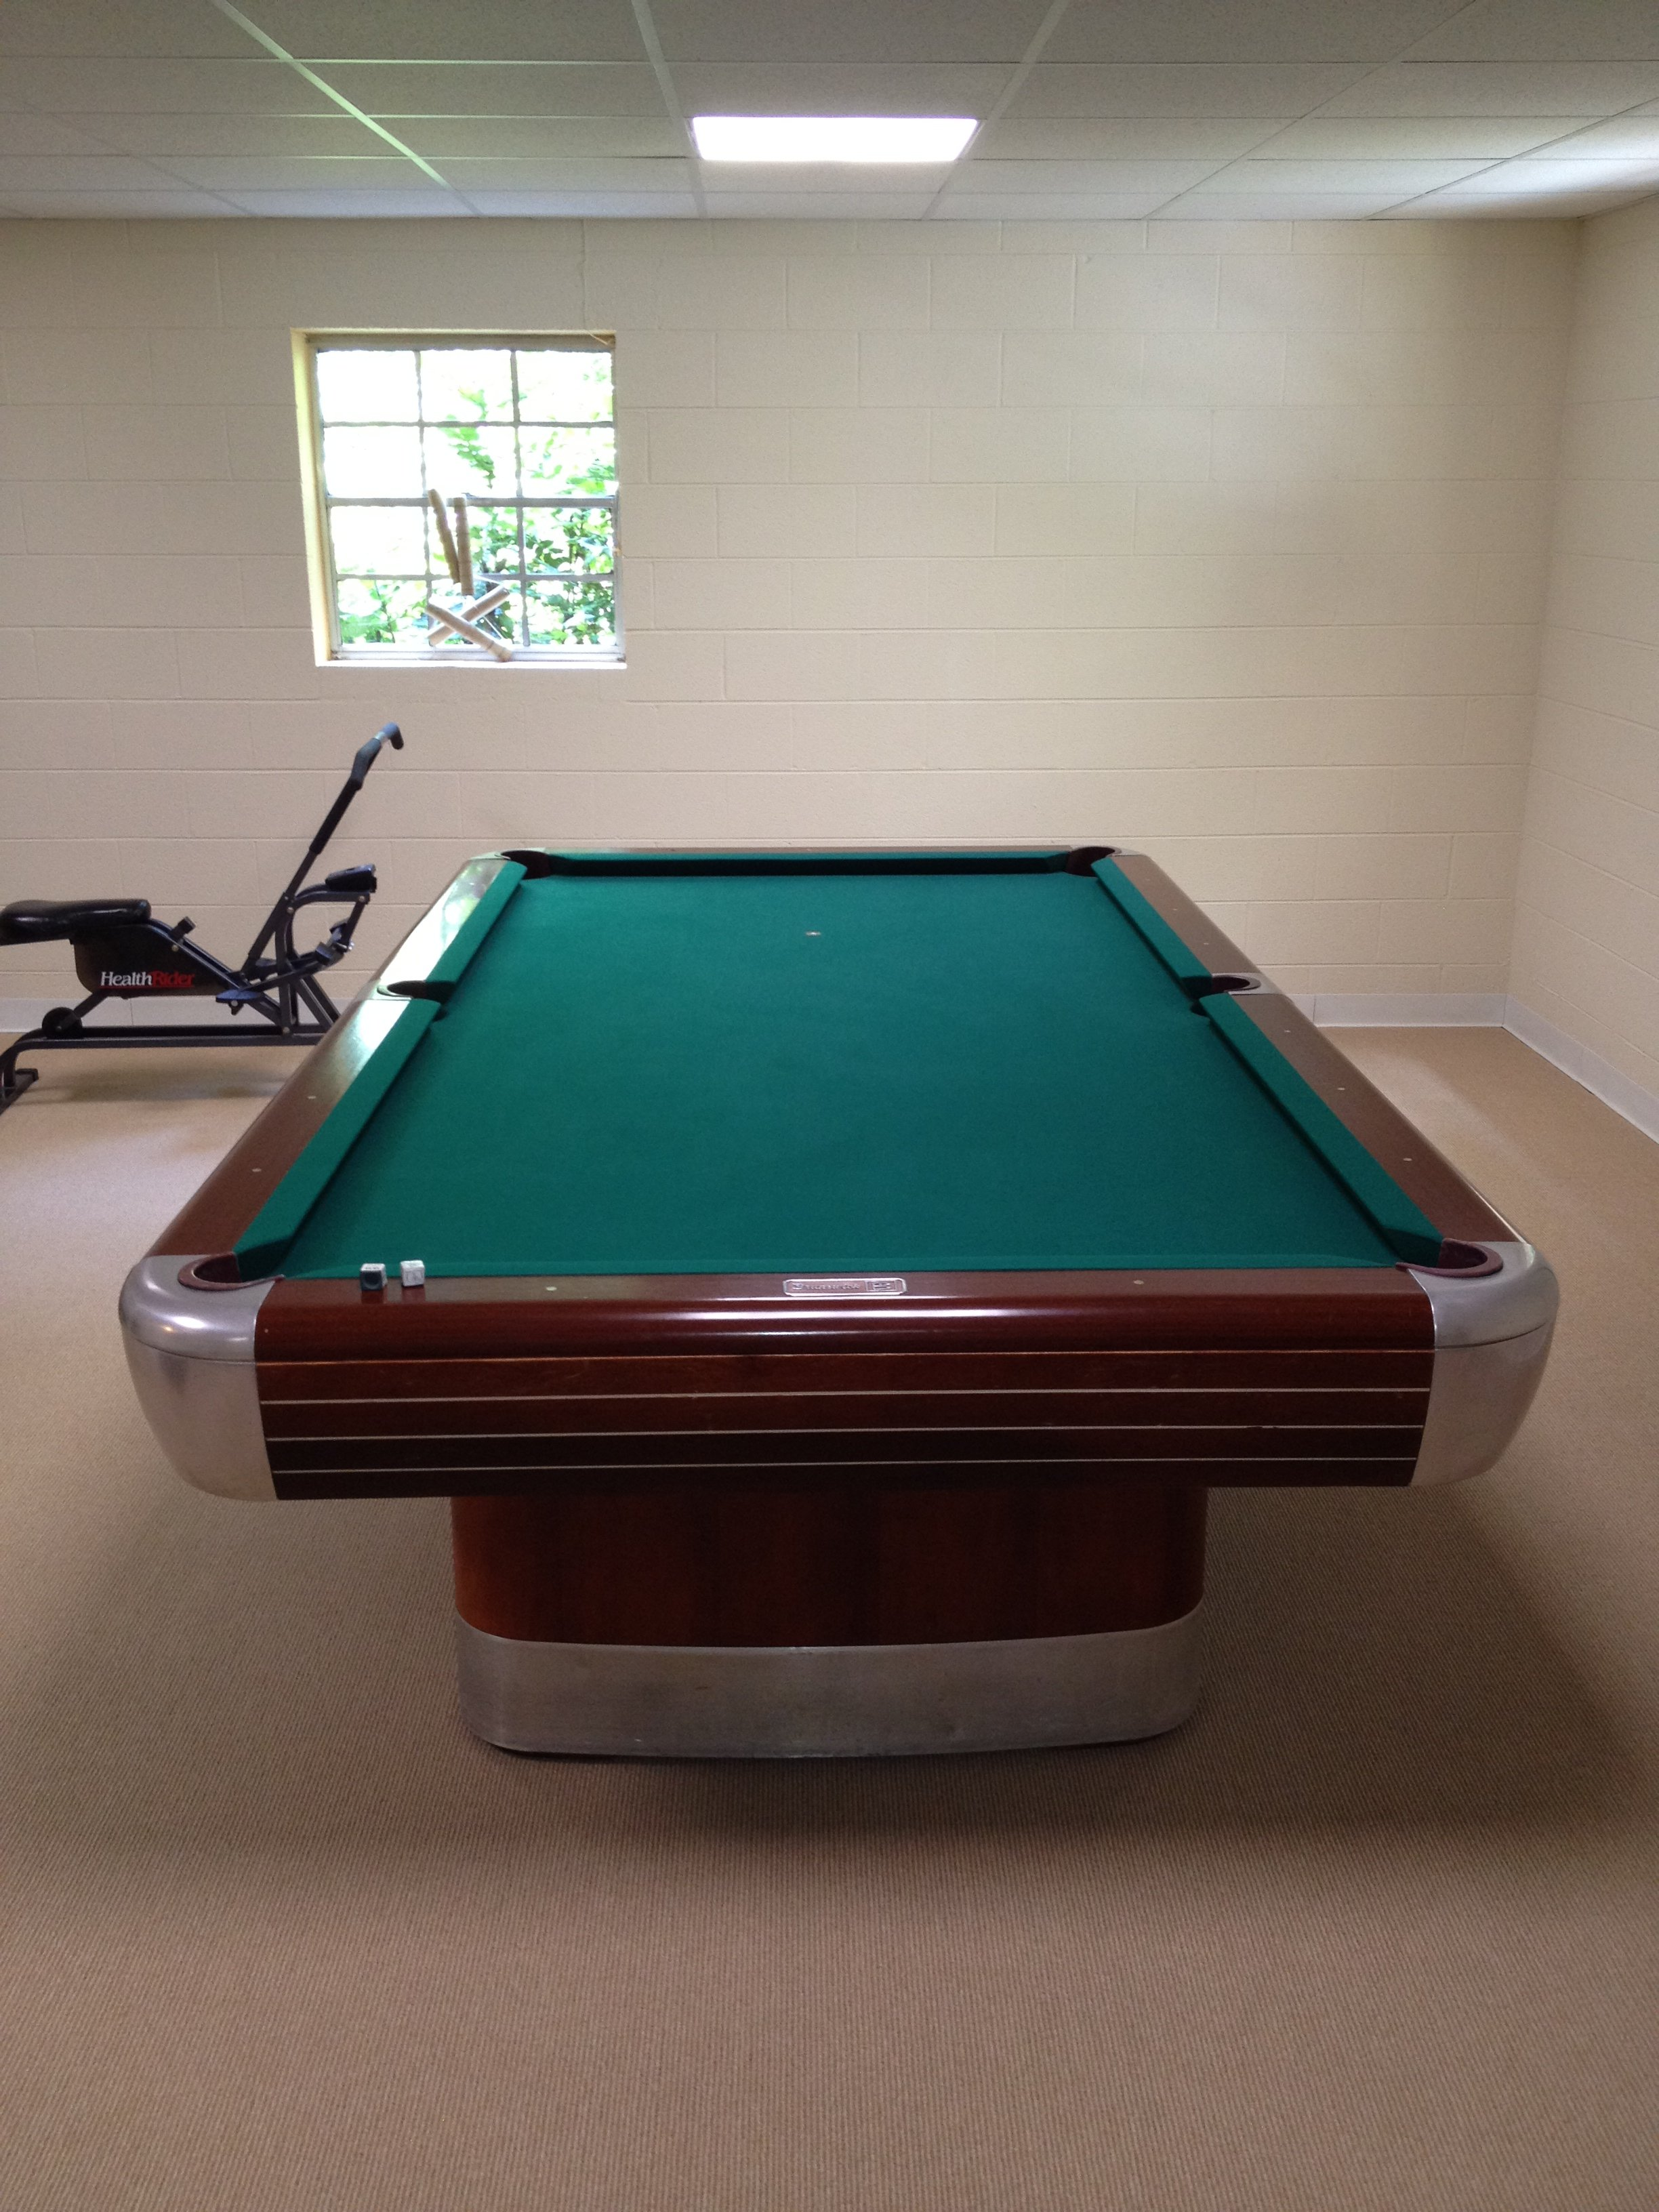 I have a Brunswick Anniversary pool table Model D C It has 3